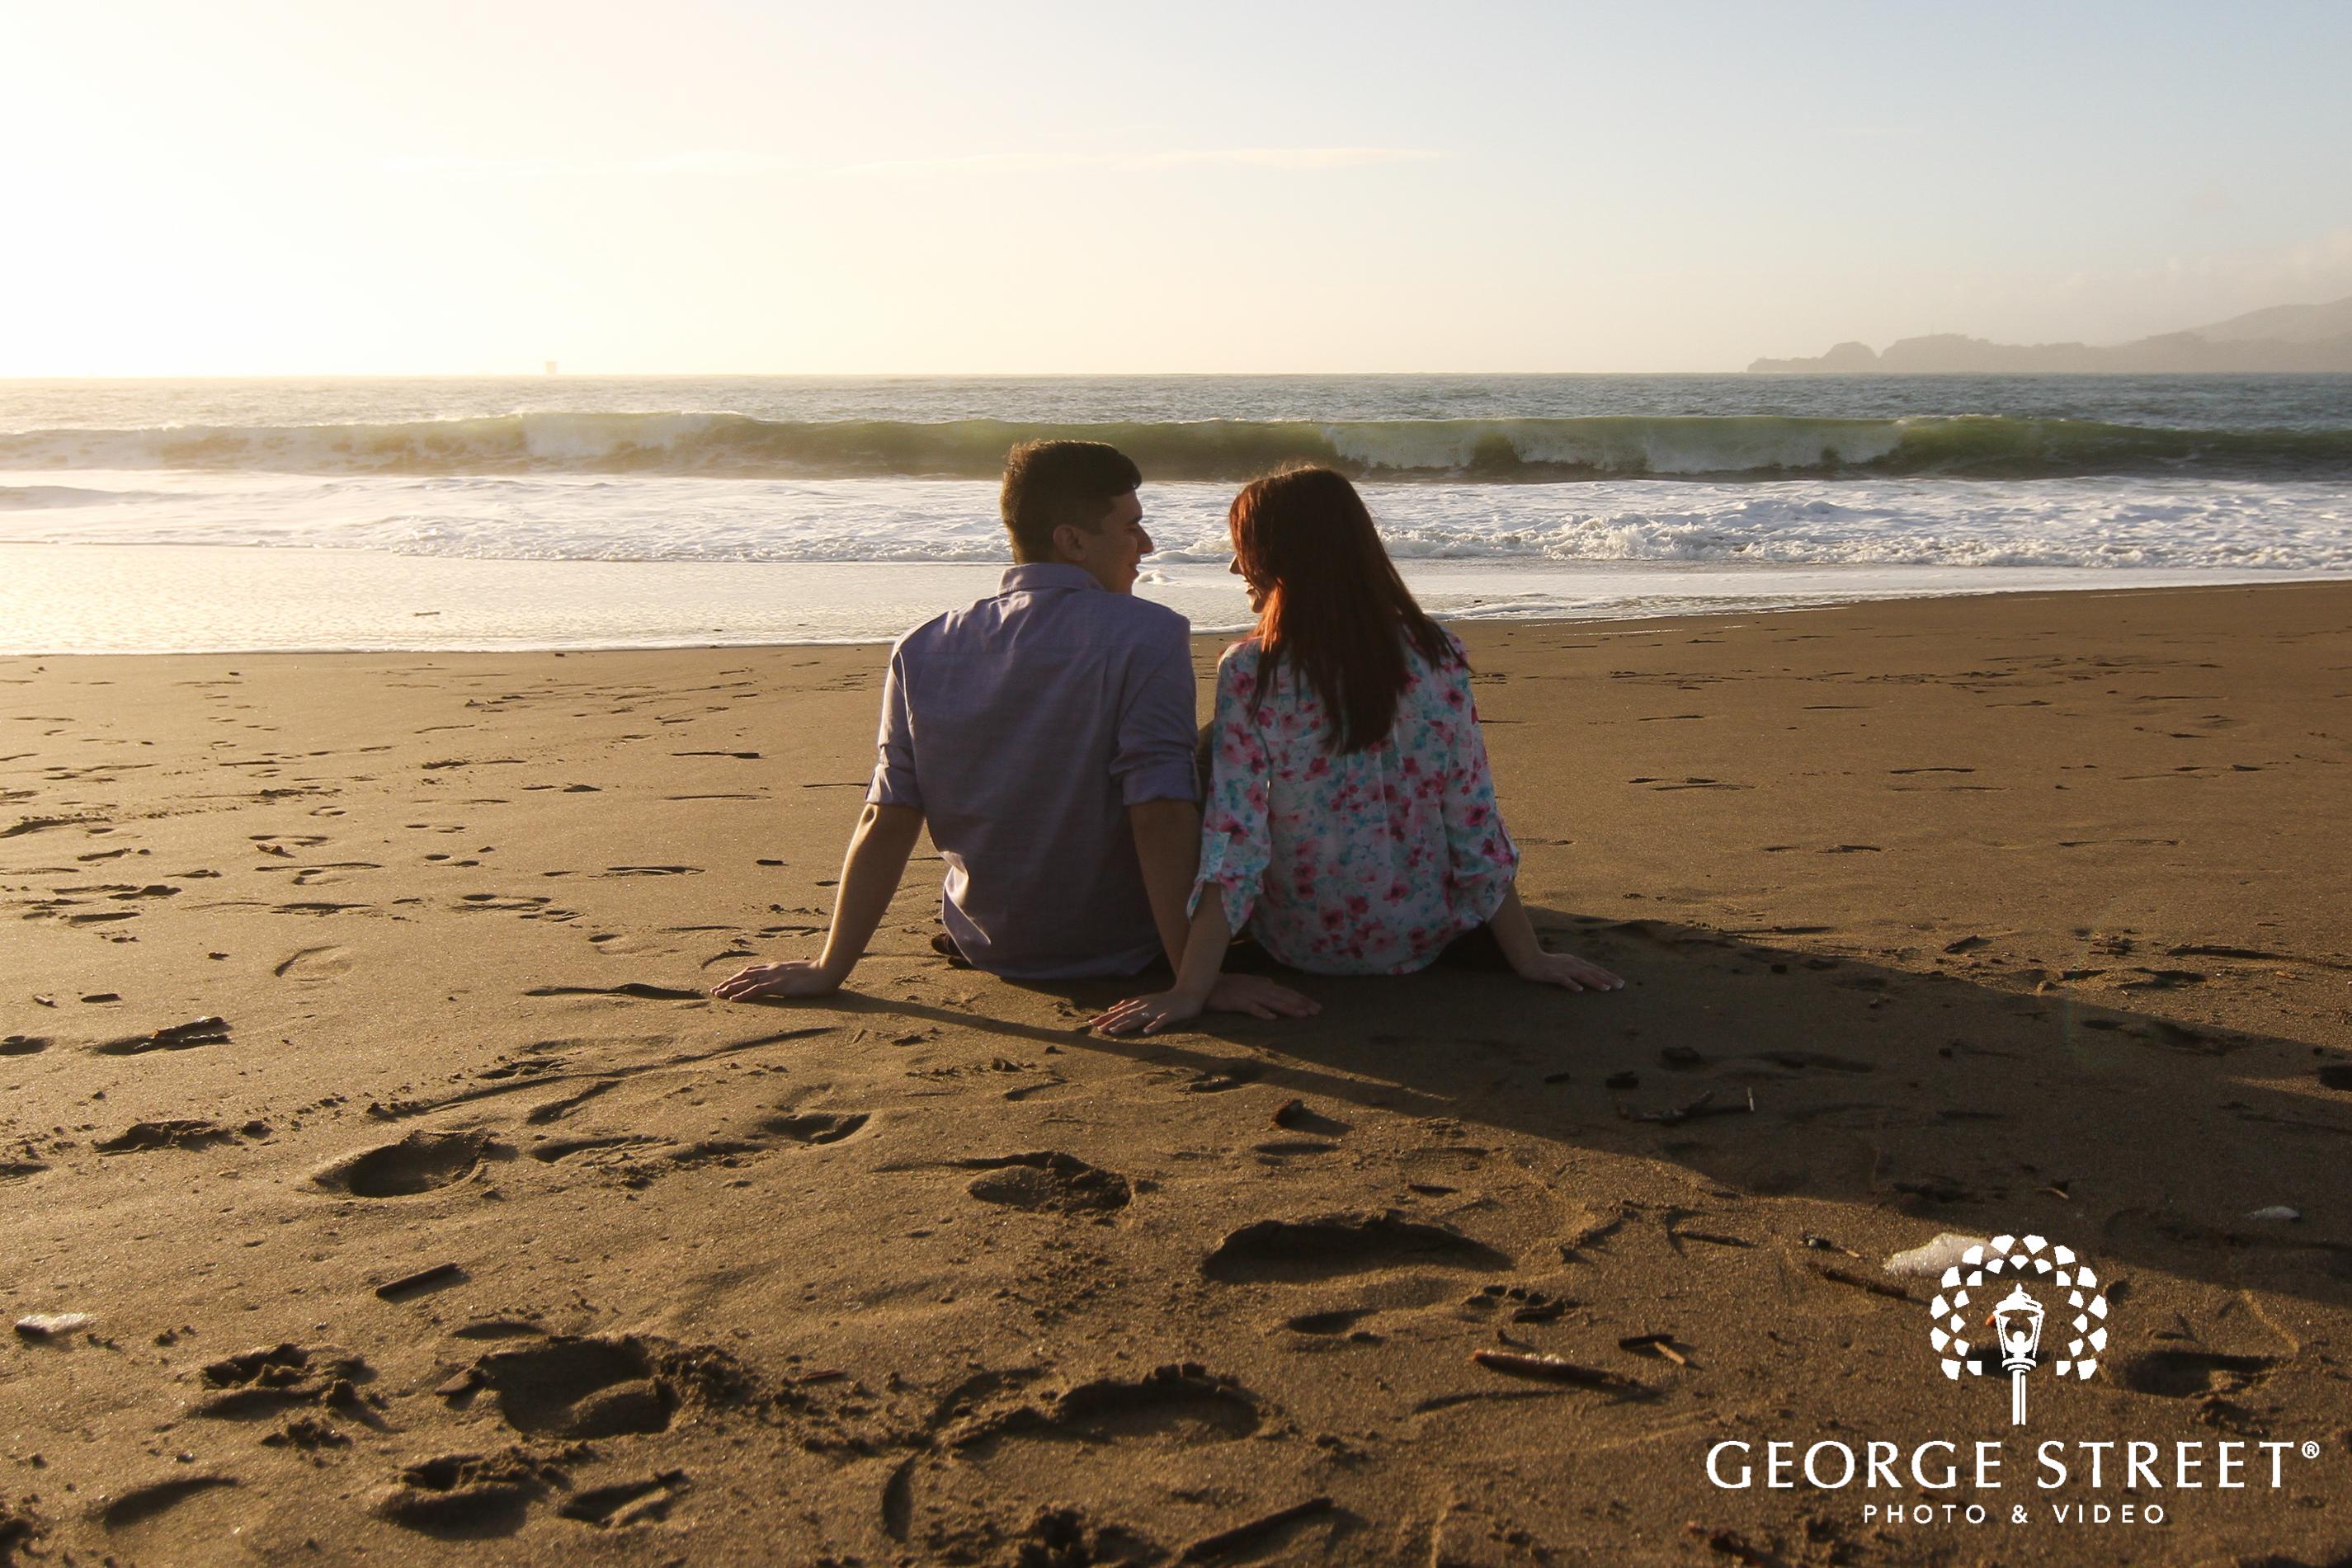 couple sitting on sand at beach